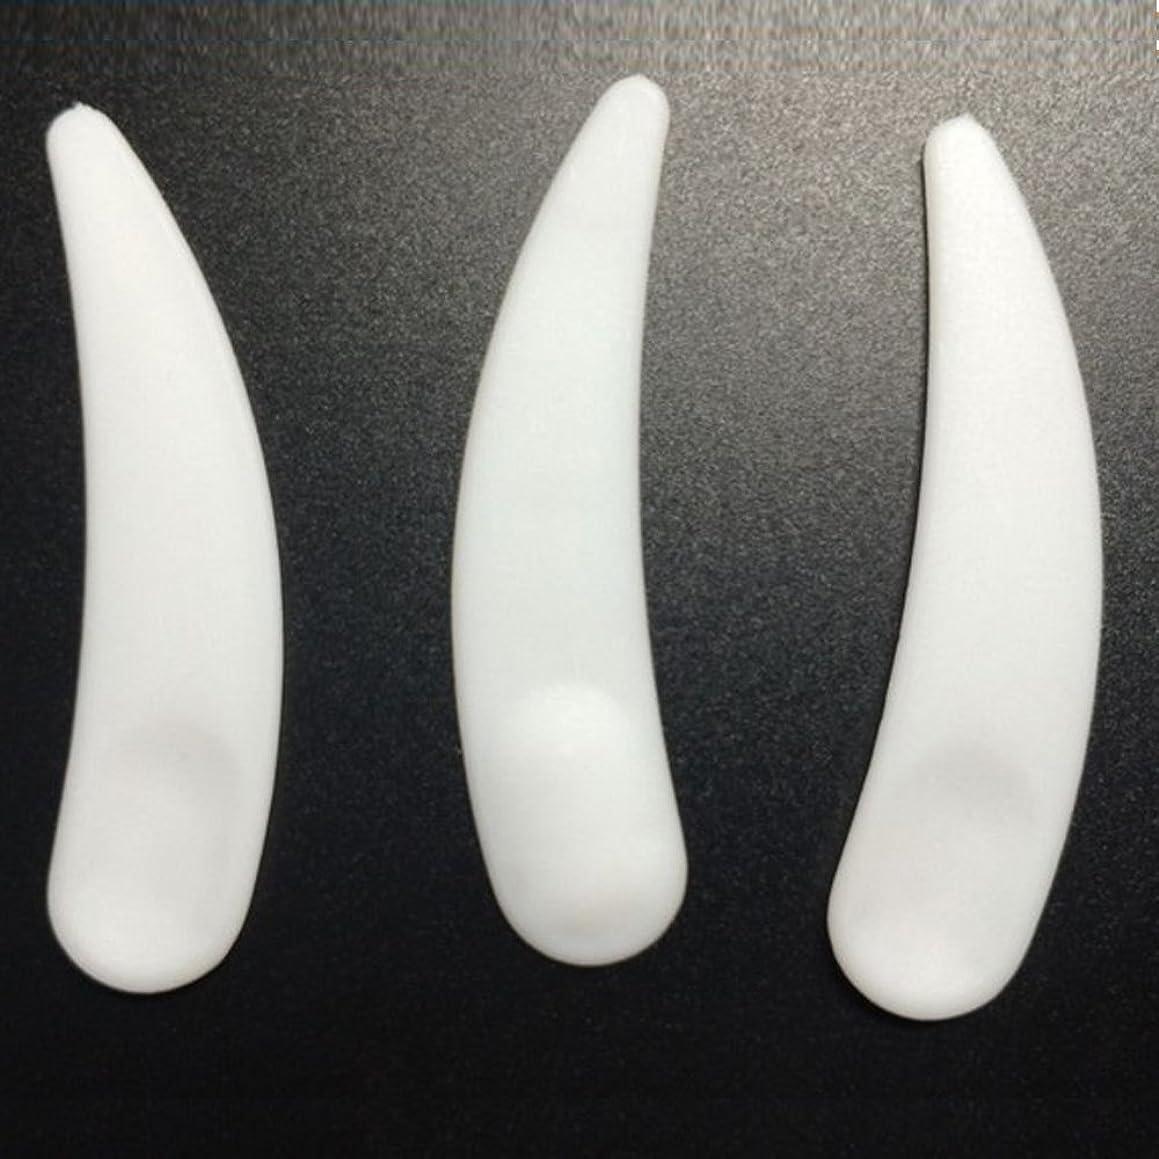 10Pcs White Mini Curved Cosmetic Spatula Scoop Makeup Mask Spatula Cream spoon Plastic Spoon